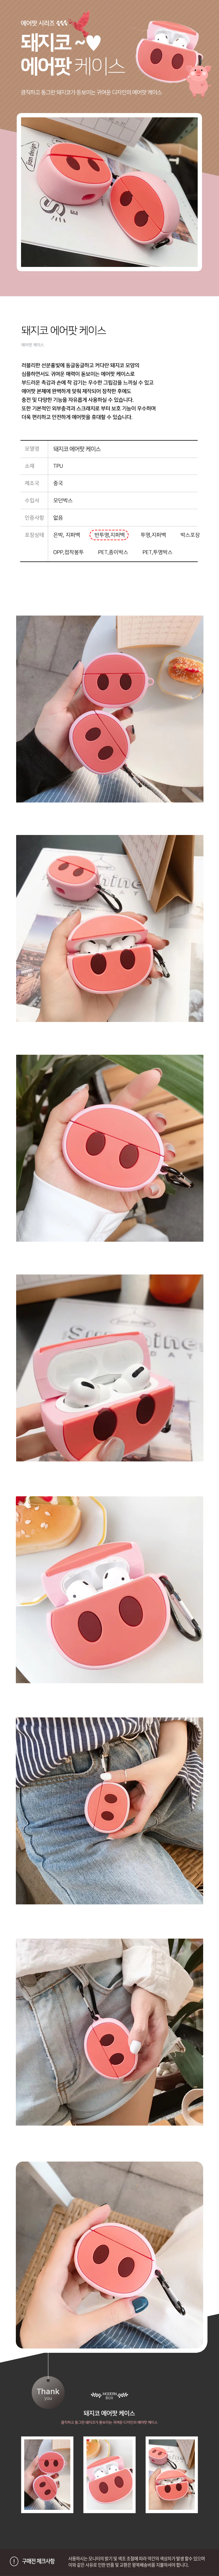 Pig nose air pot case